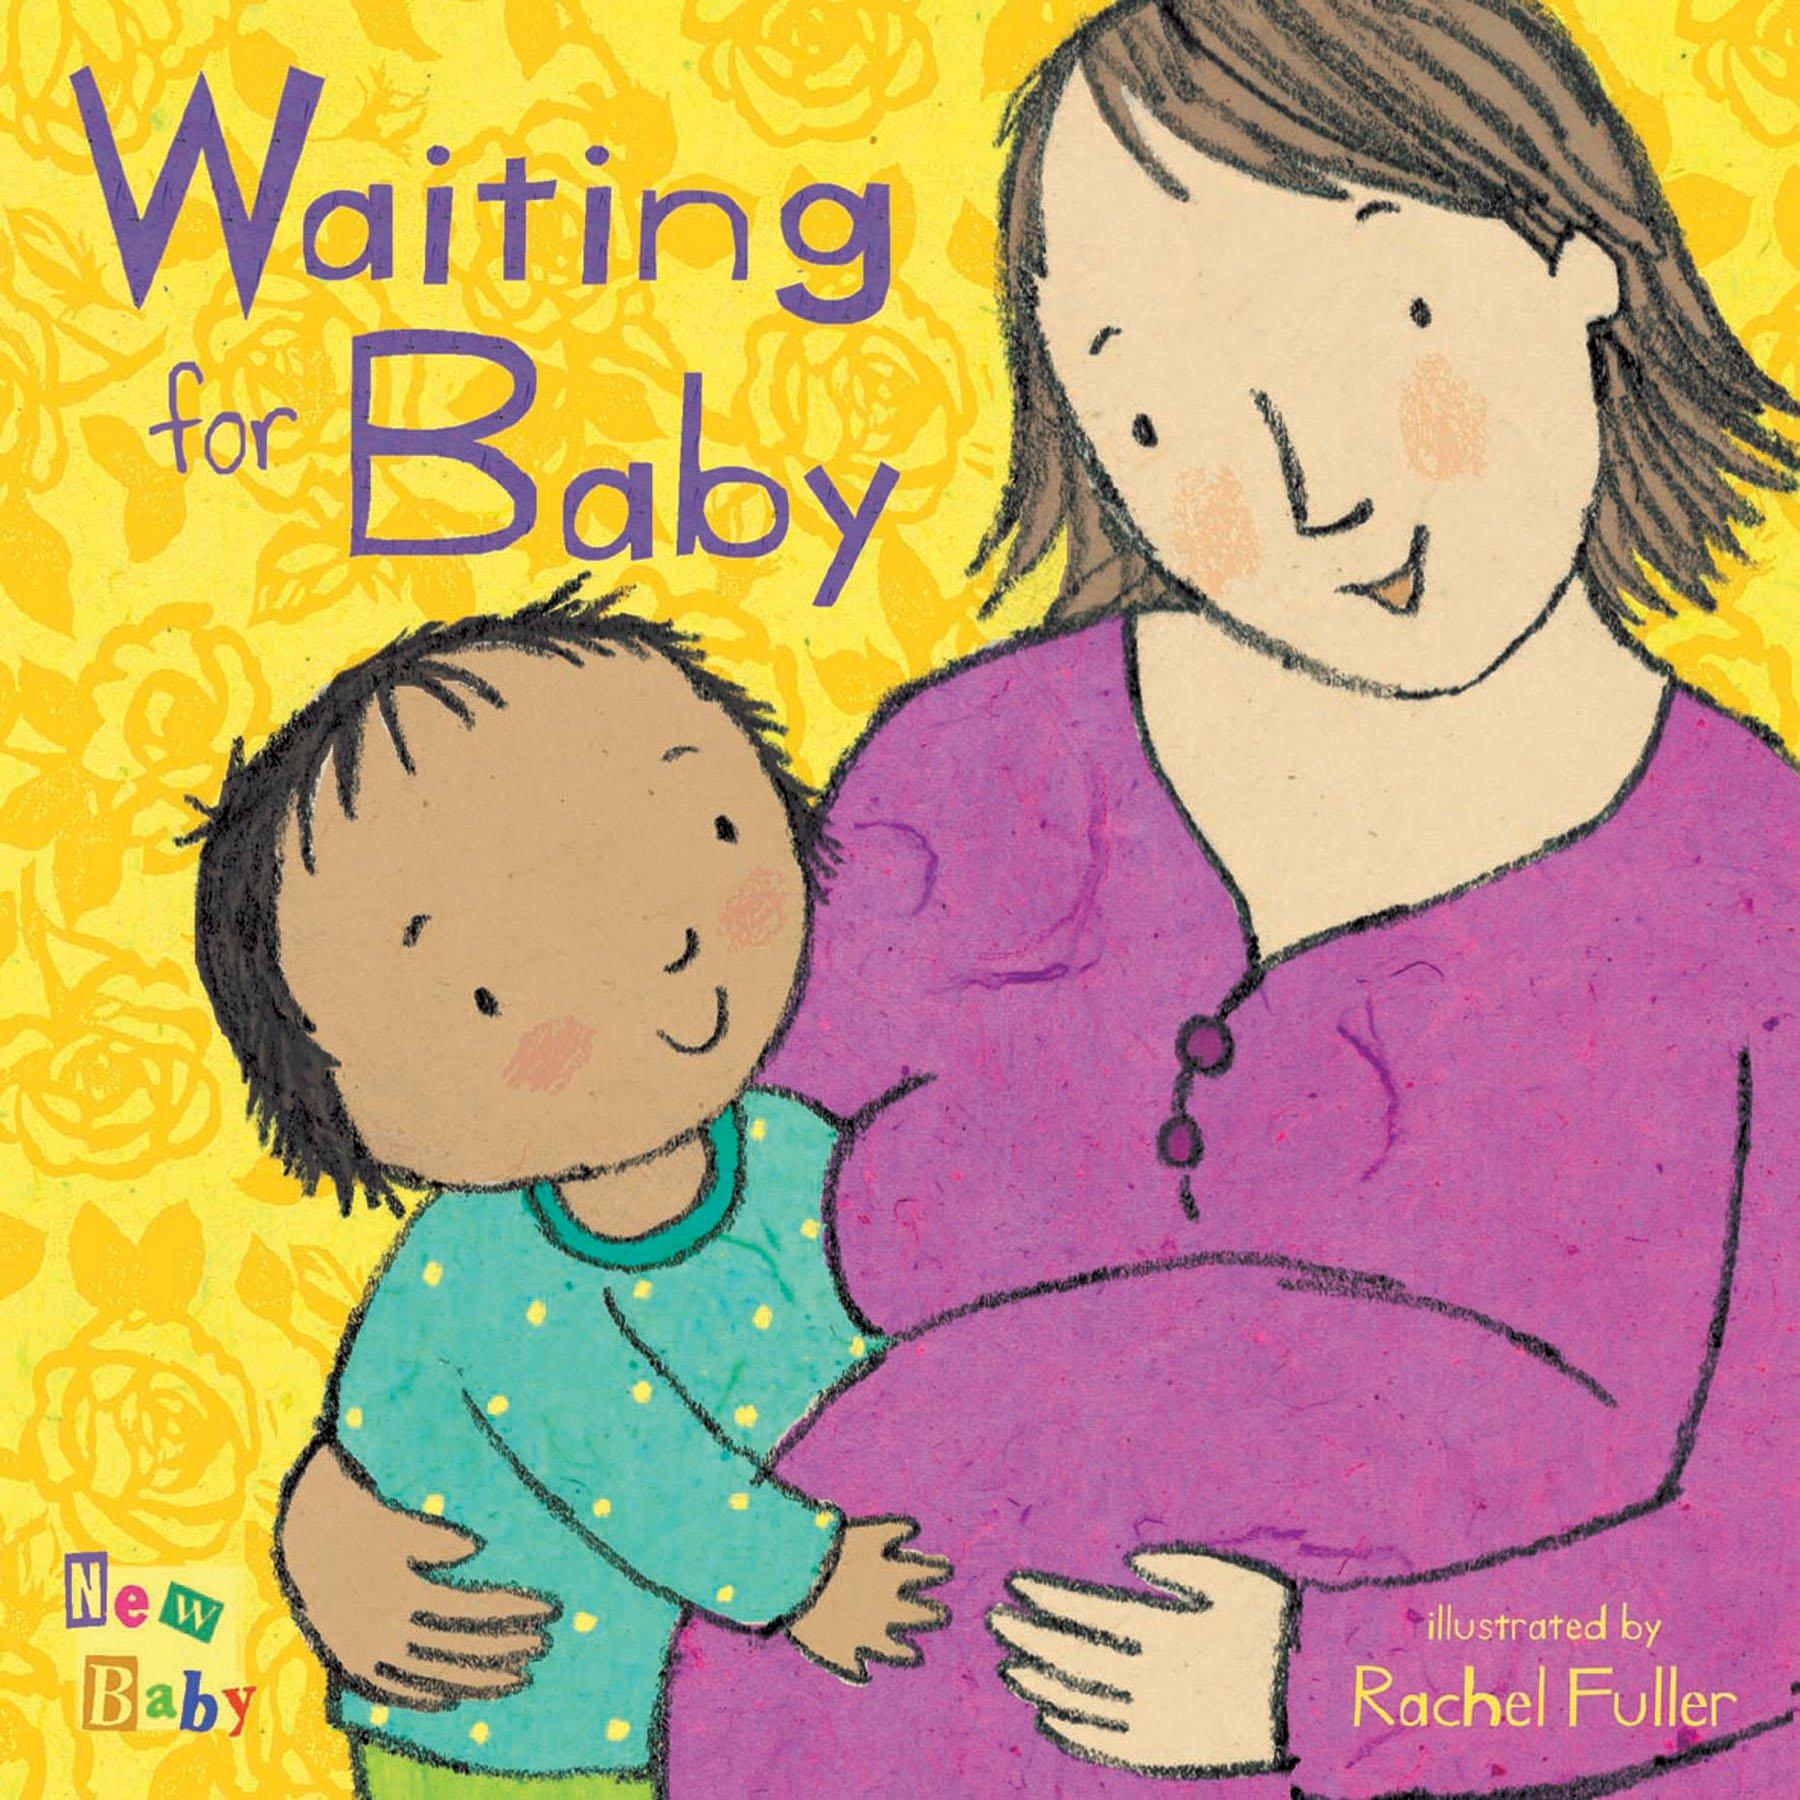 Waiting for Baby by Rachel Fuller